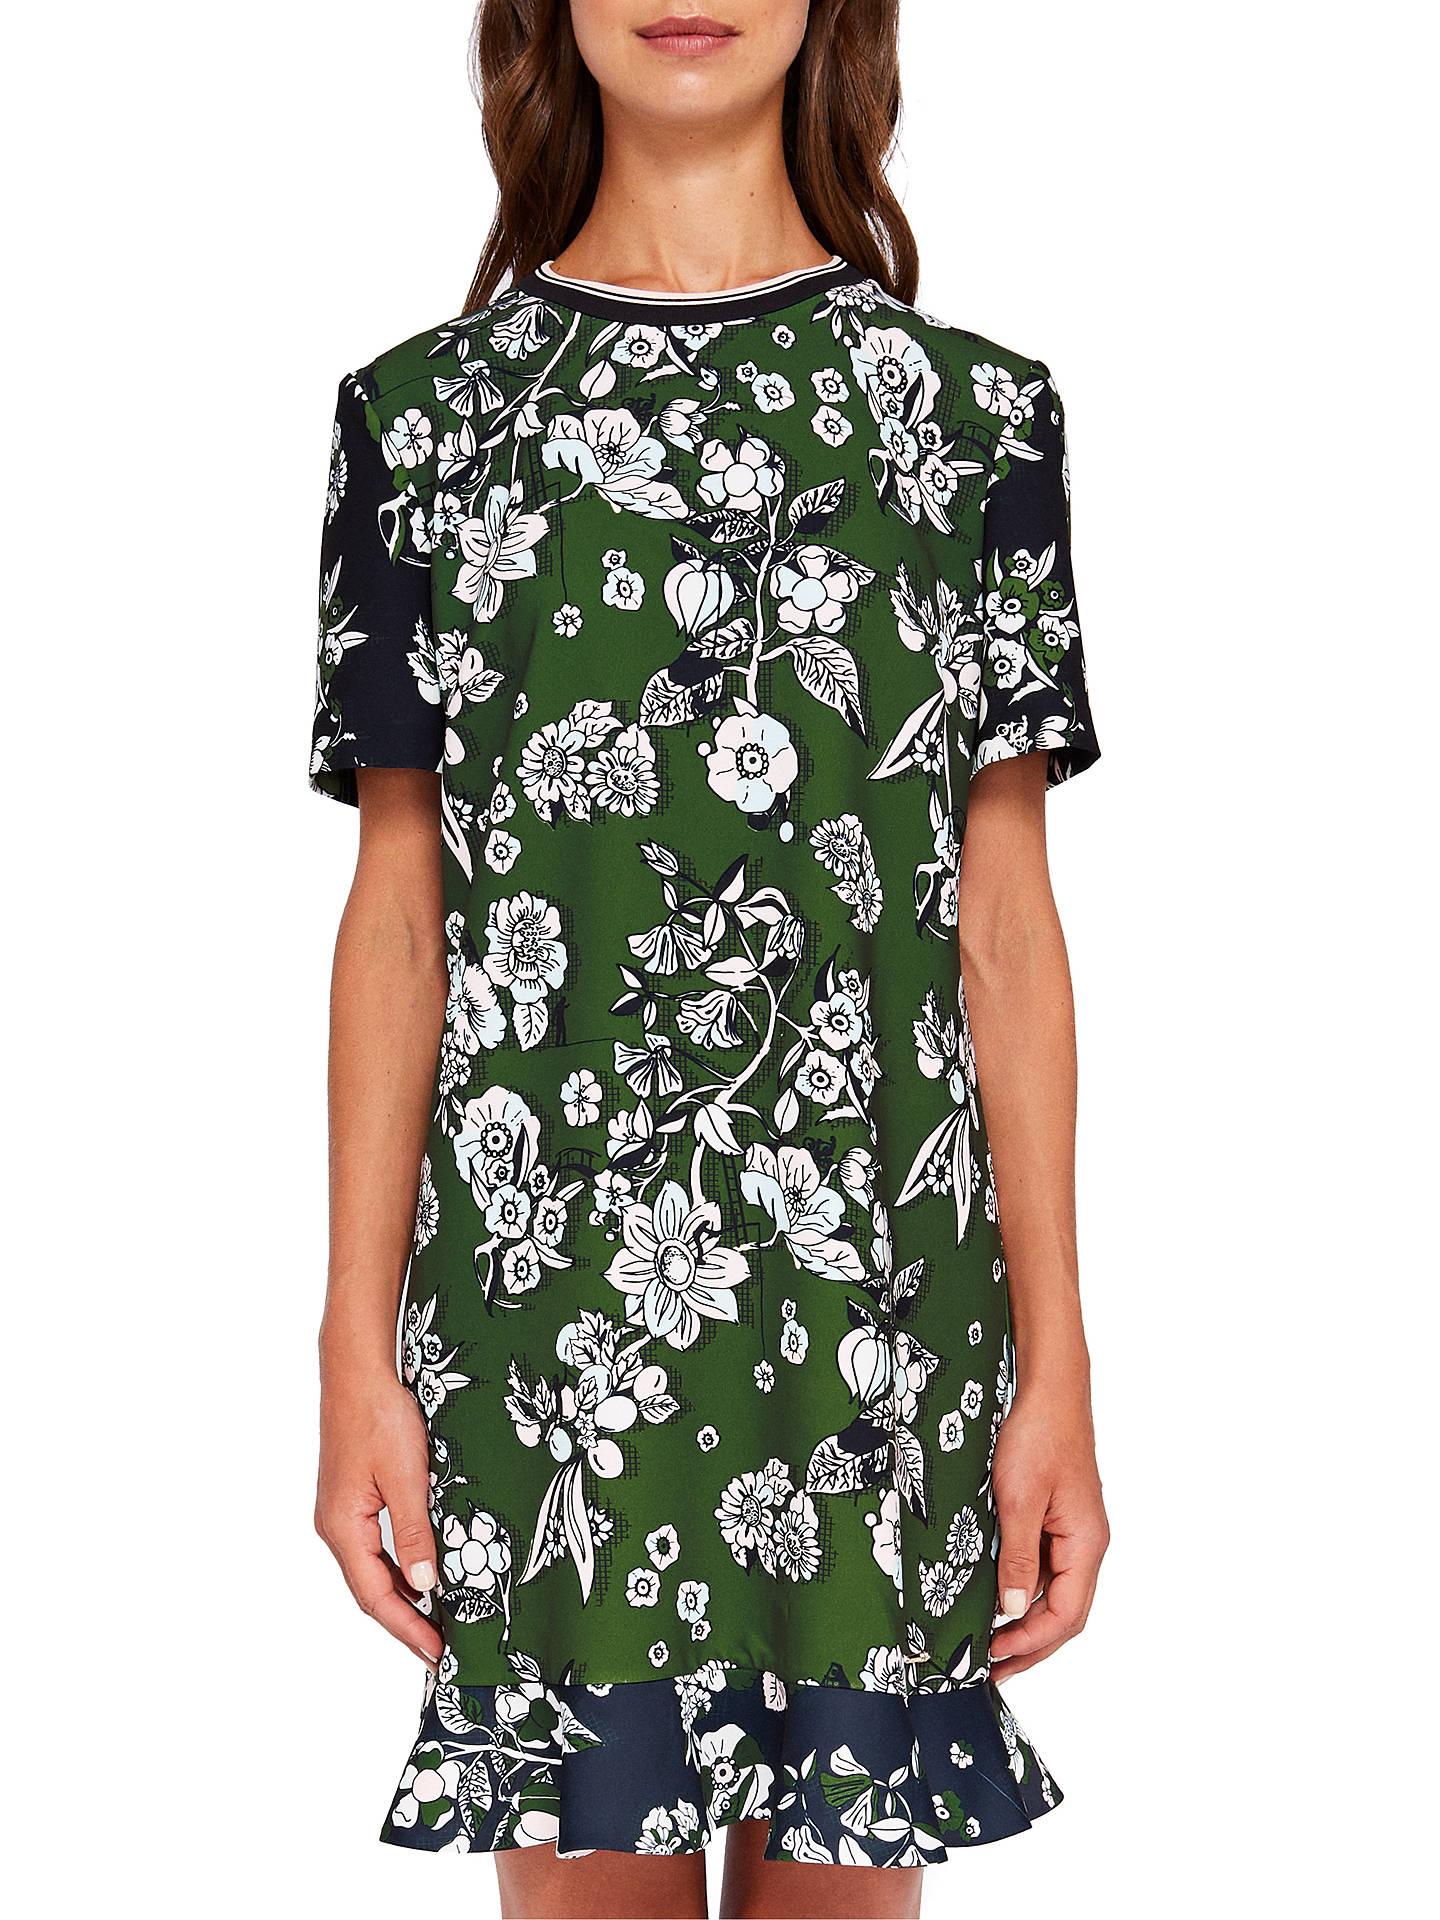 fbc54fcc48d Buy Ted Baker Hoster Floral Print Frill Hem Dress